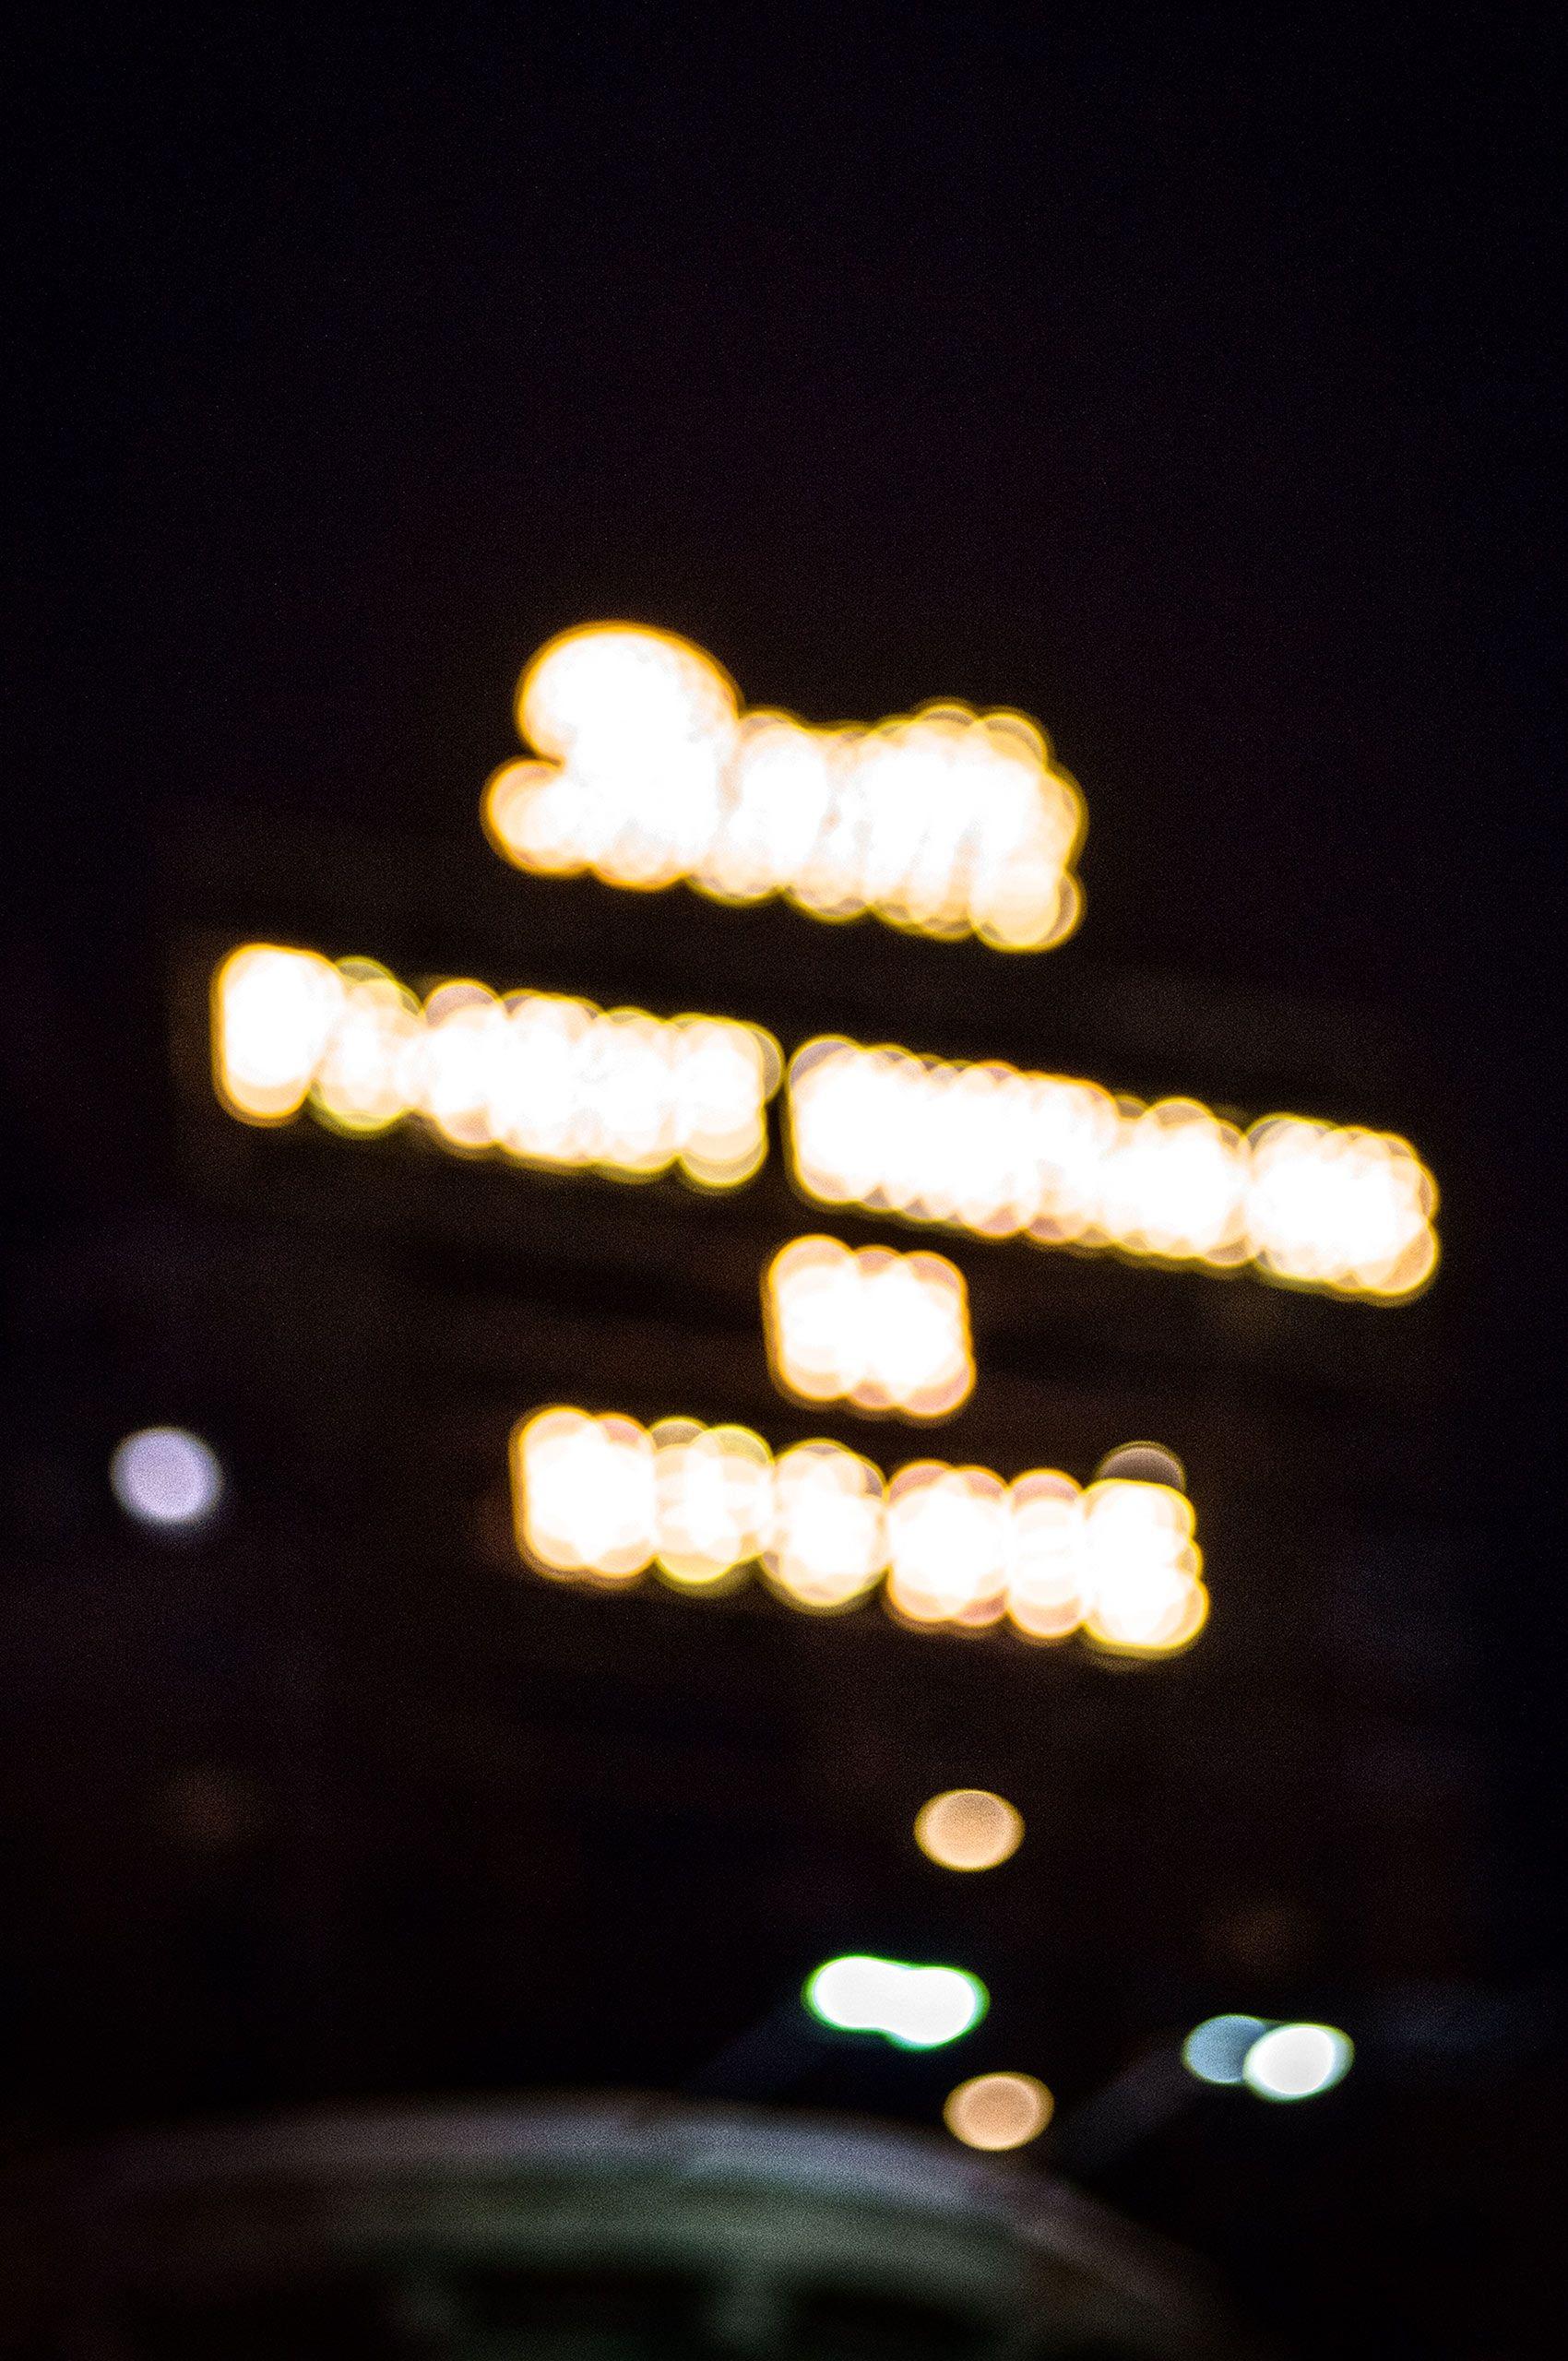 Blurry-Neonsign-NewYork-HenrikOlundPhotography.jpg